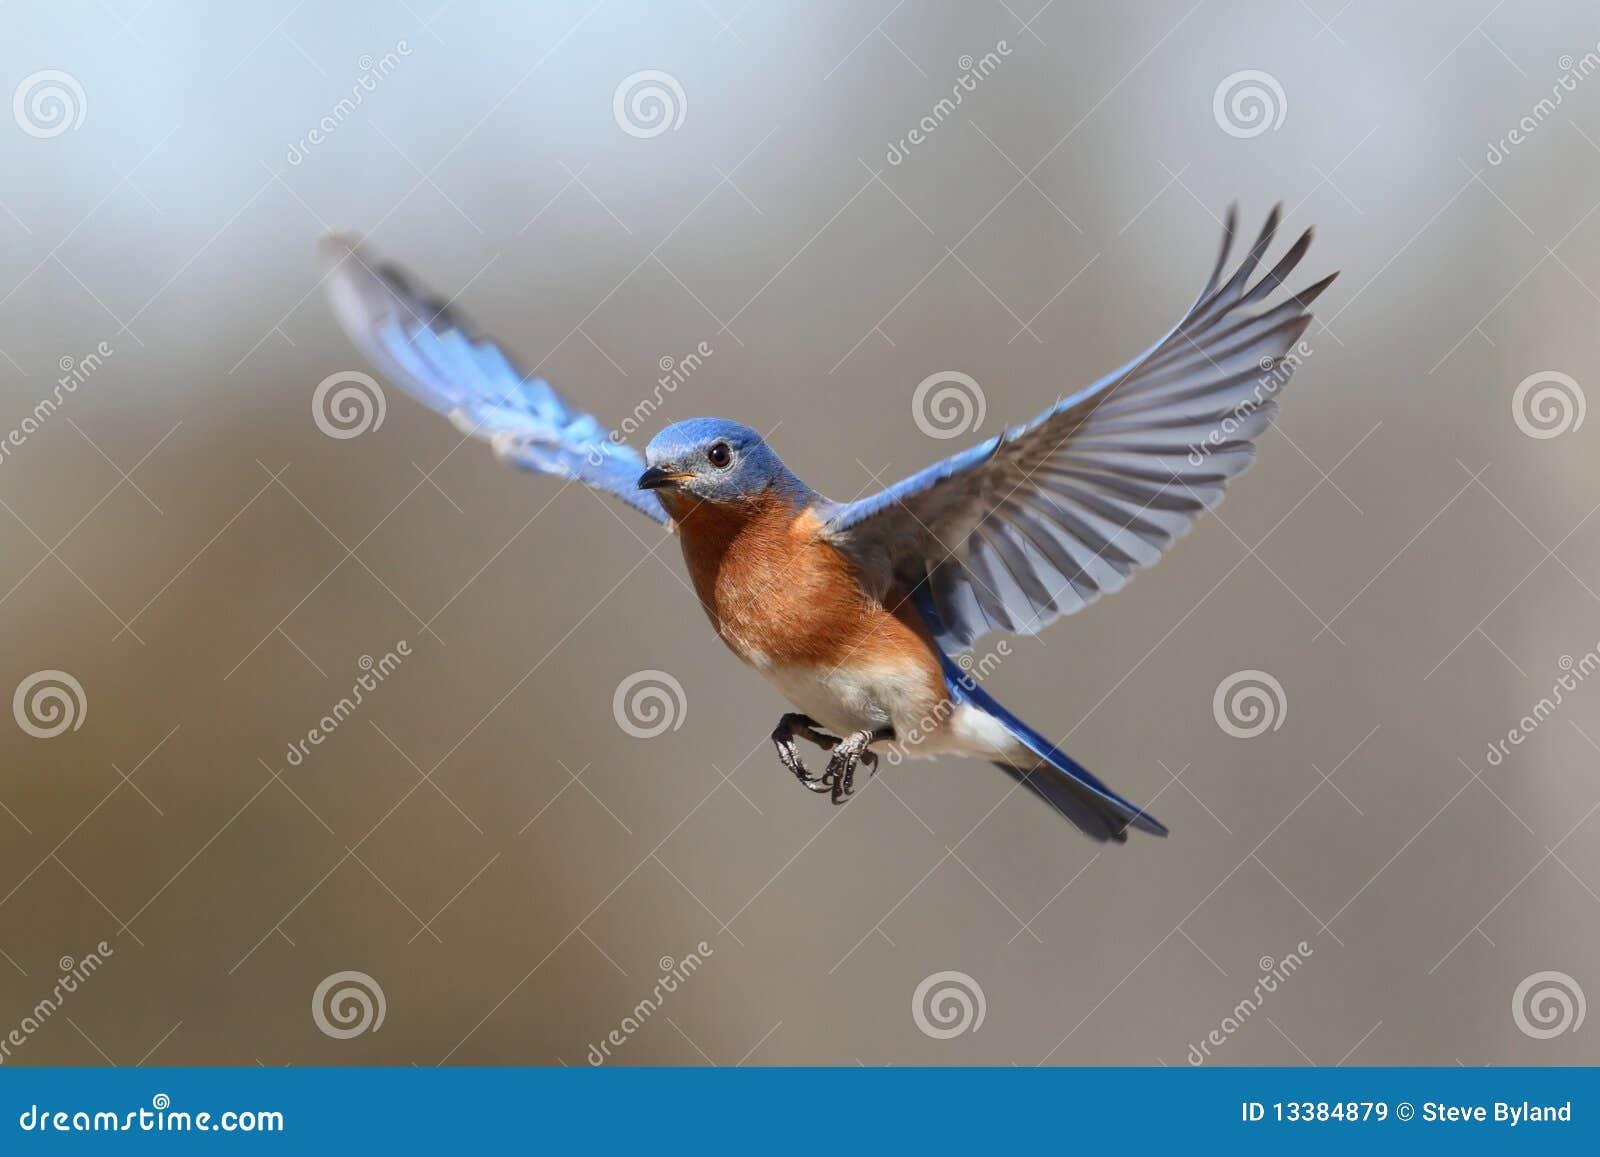 Drossel im Flug